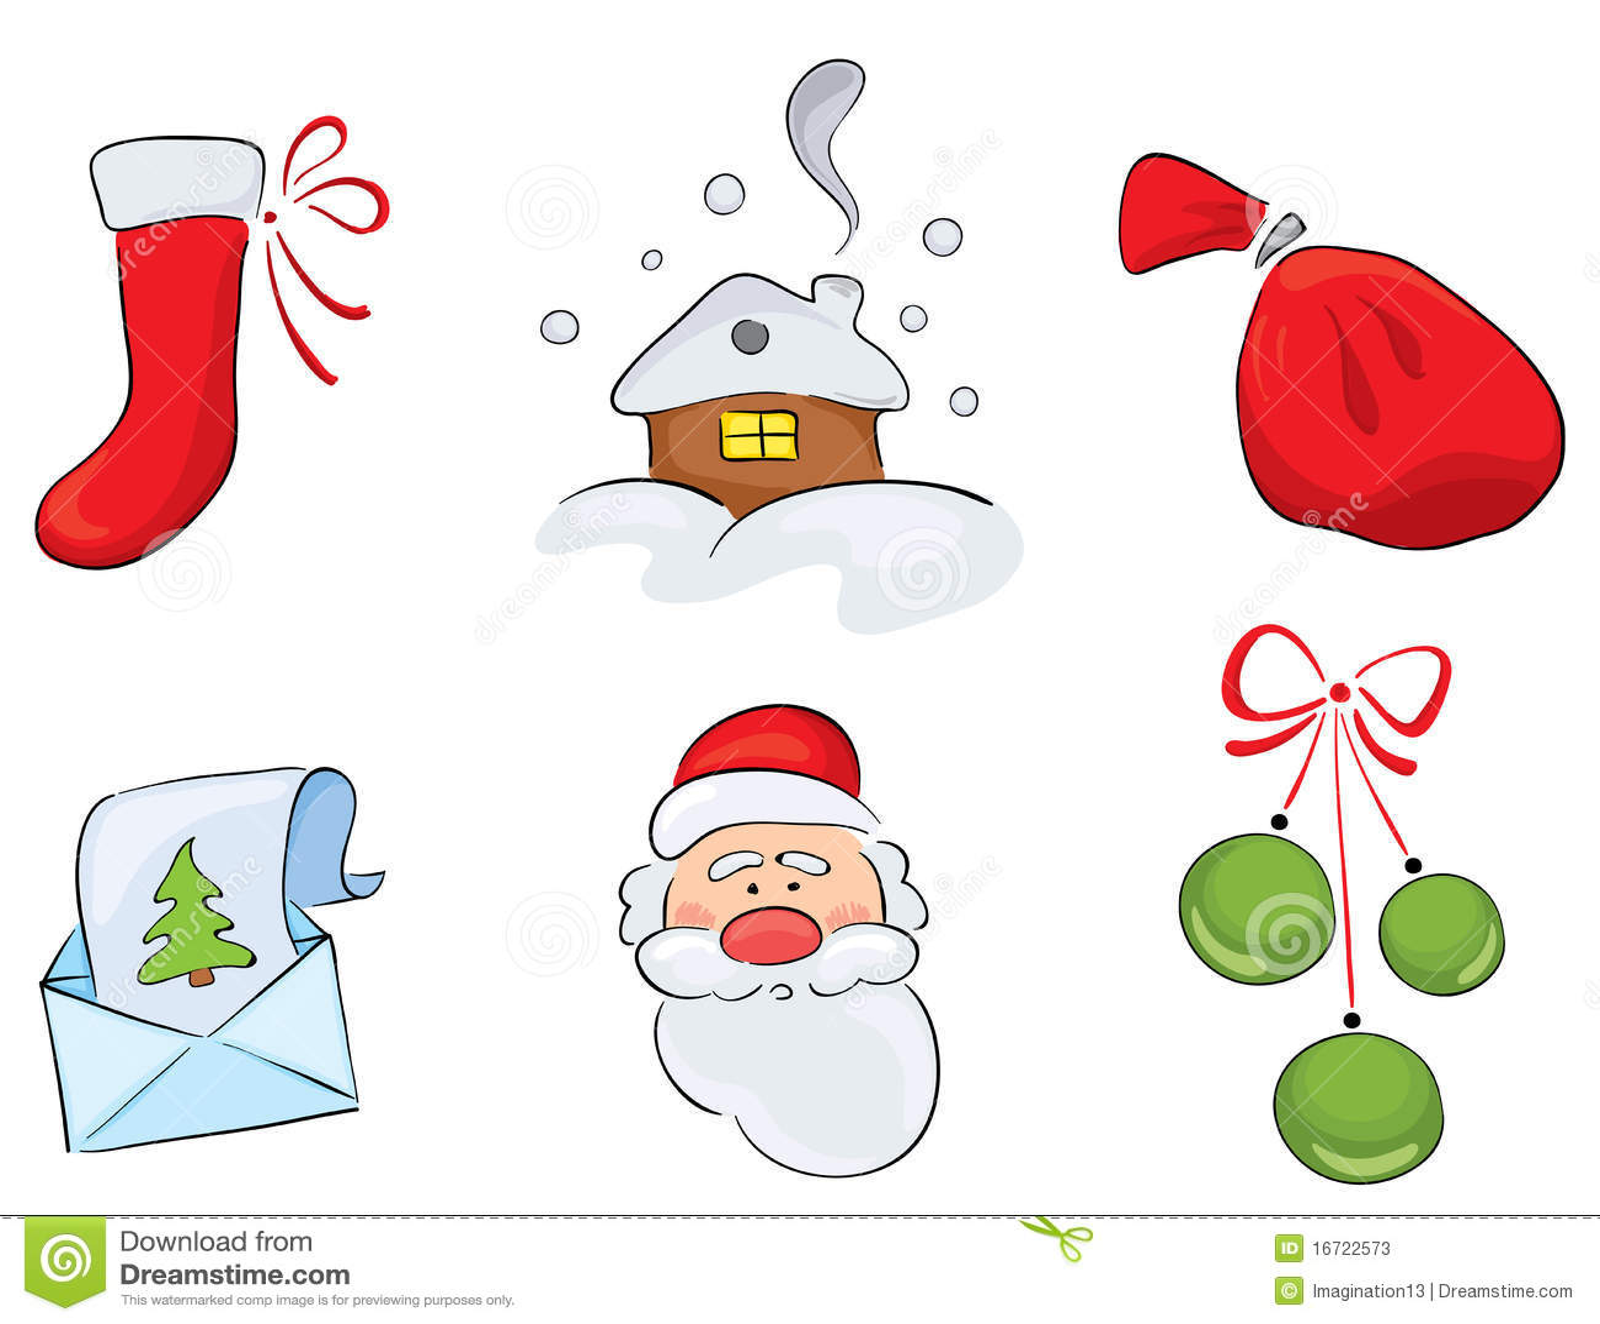 Set Of Watercolor Christmas Drawings Stock Photos Image